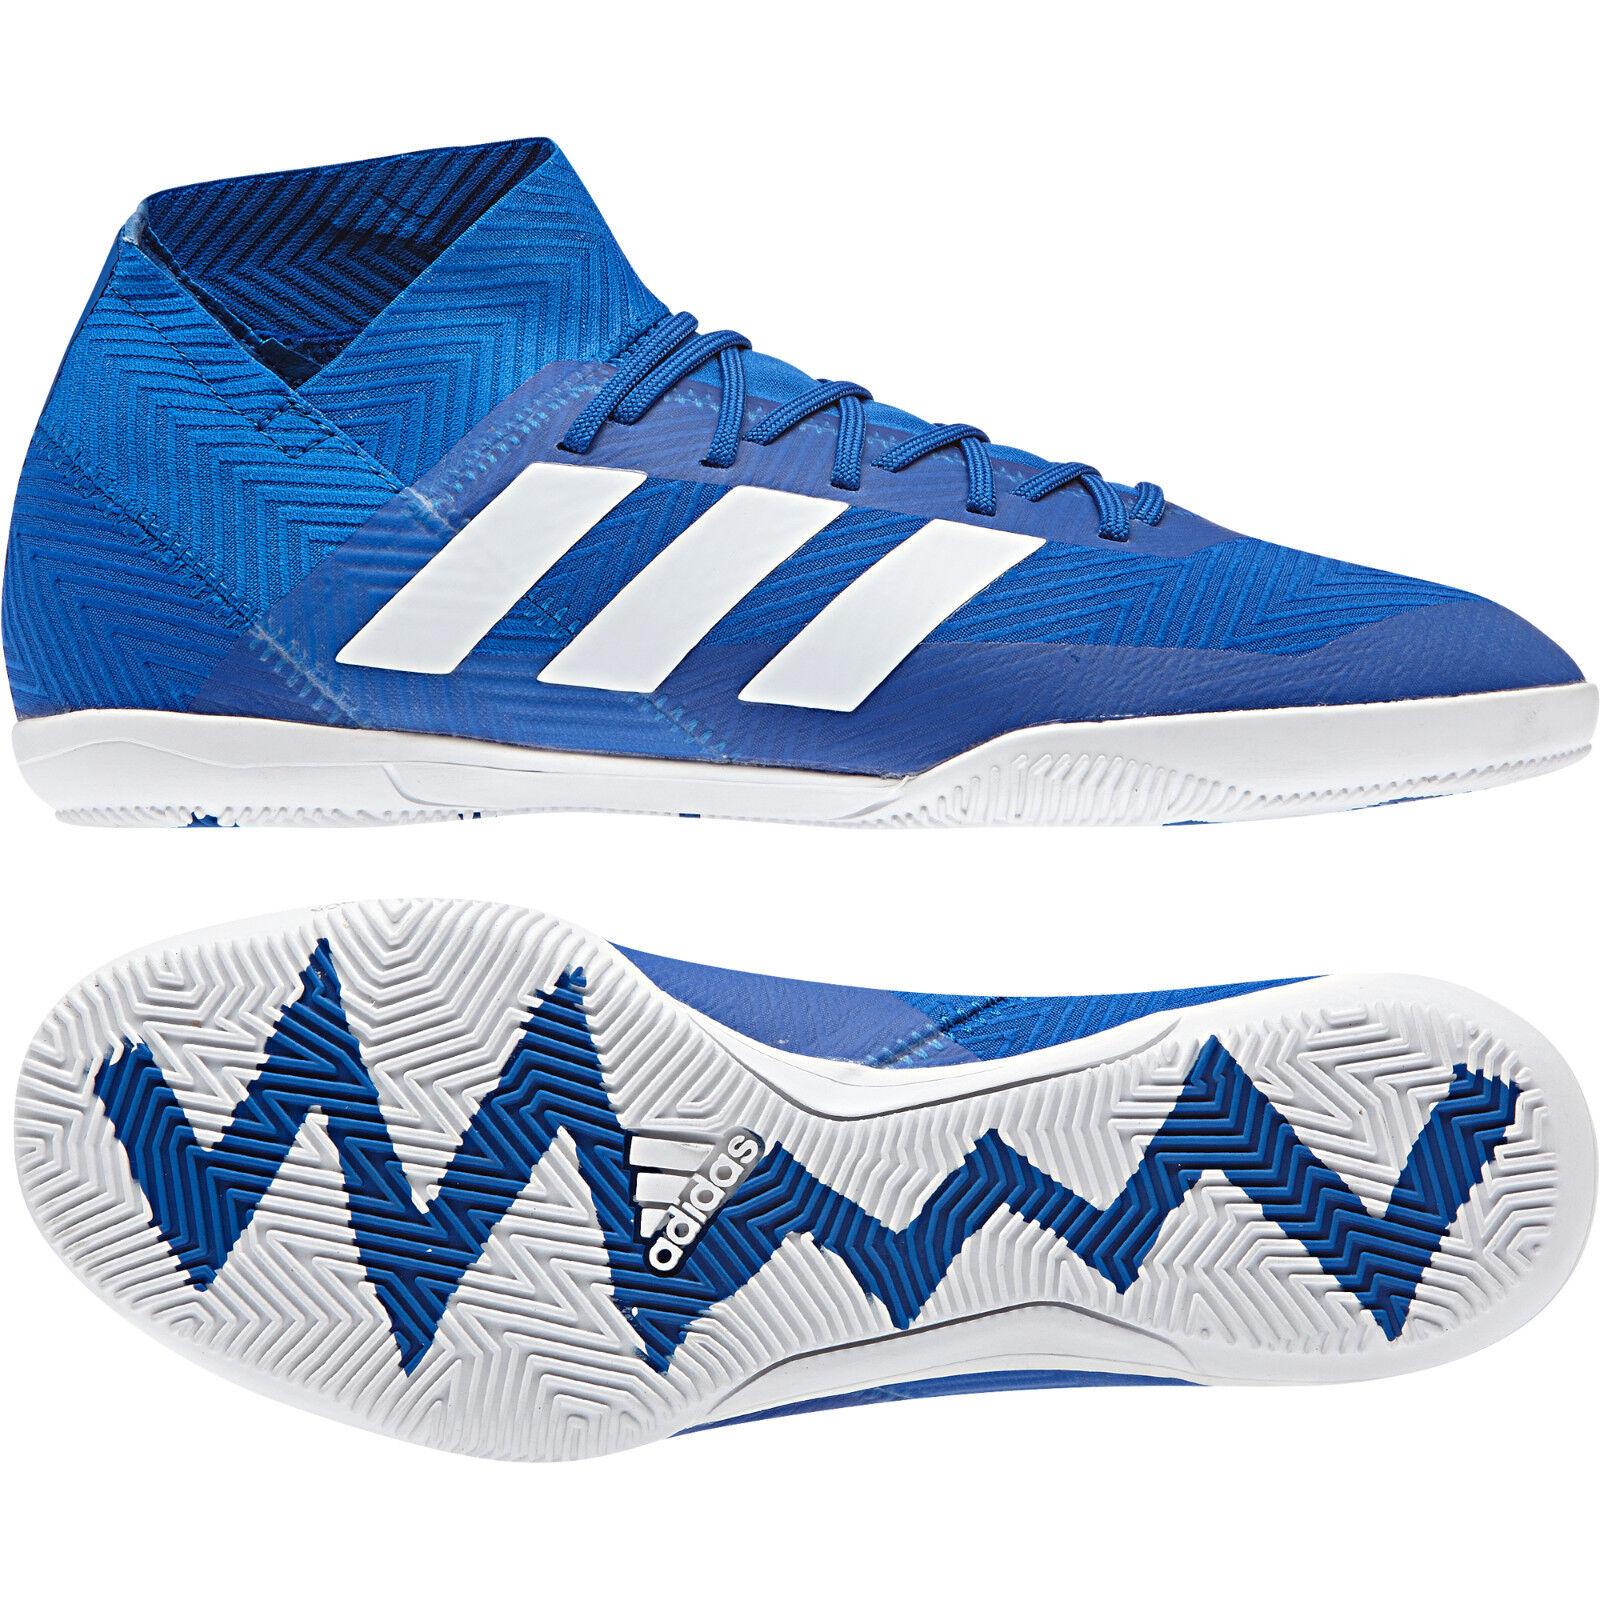 Adidas Men Boots shoes Sala Soccer Nemeziz Tango 18.3 Indoor Football DB2196 New